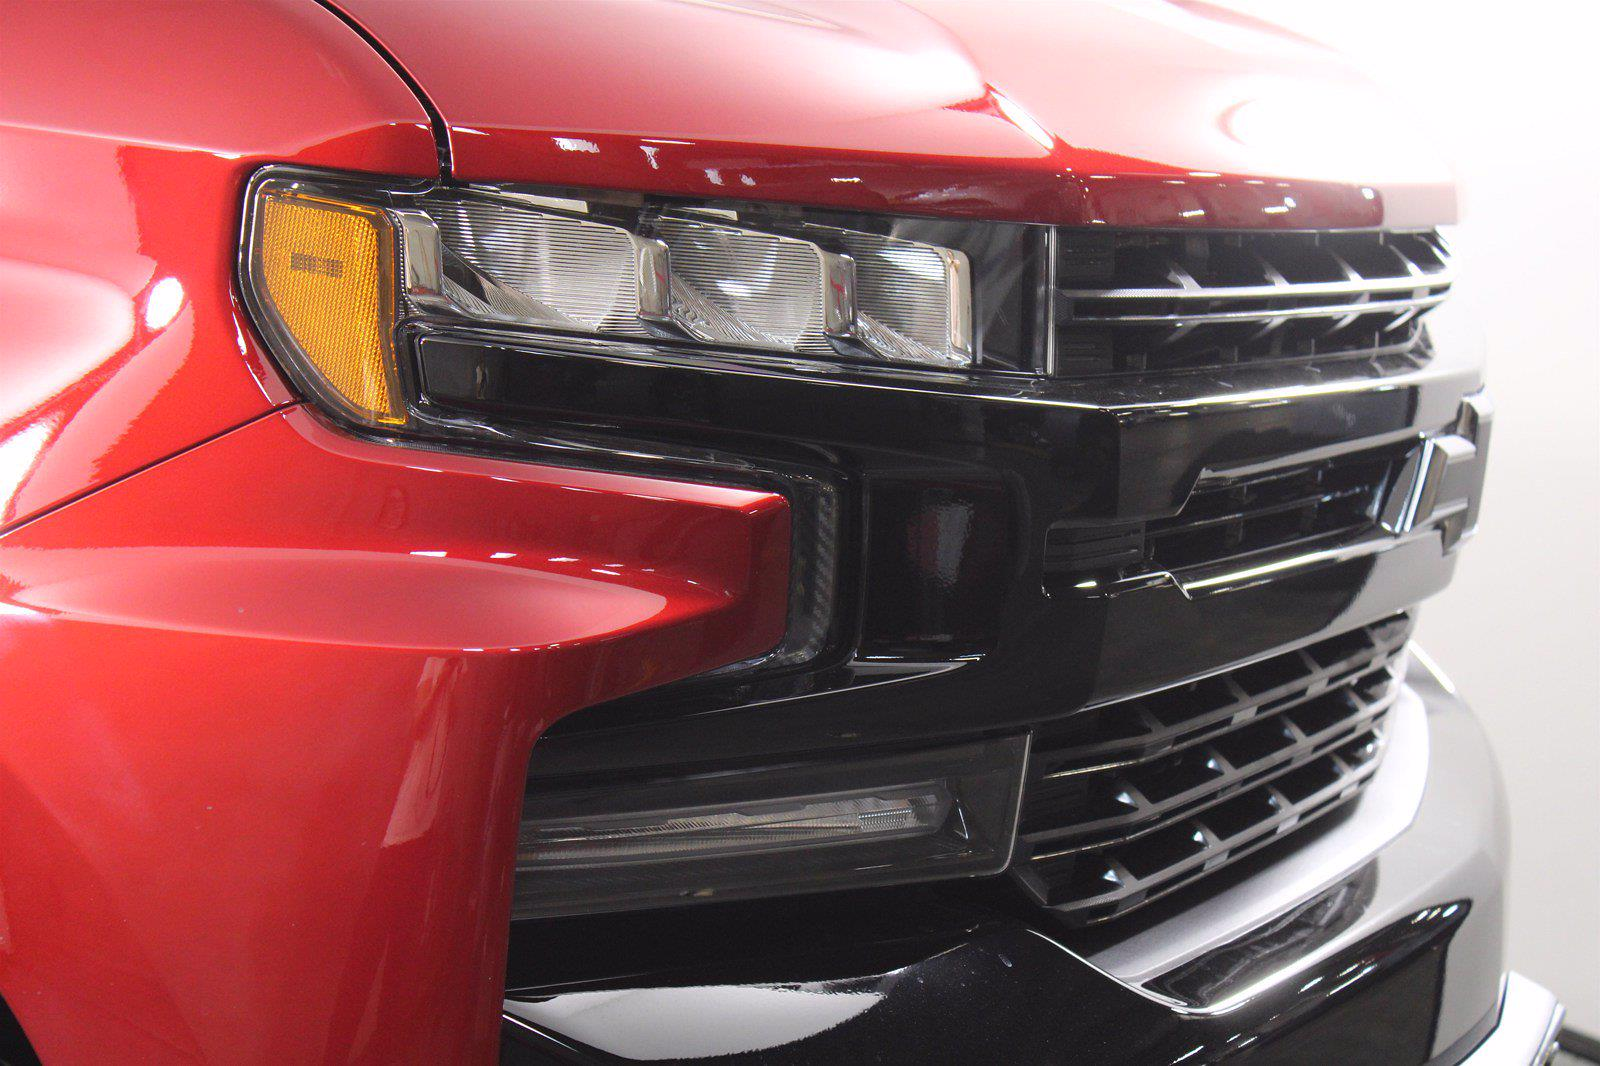 2021 Chevrolet Silverado 1500 Crew Cab 4x4, Pickup #D111109 - photo 5